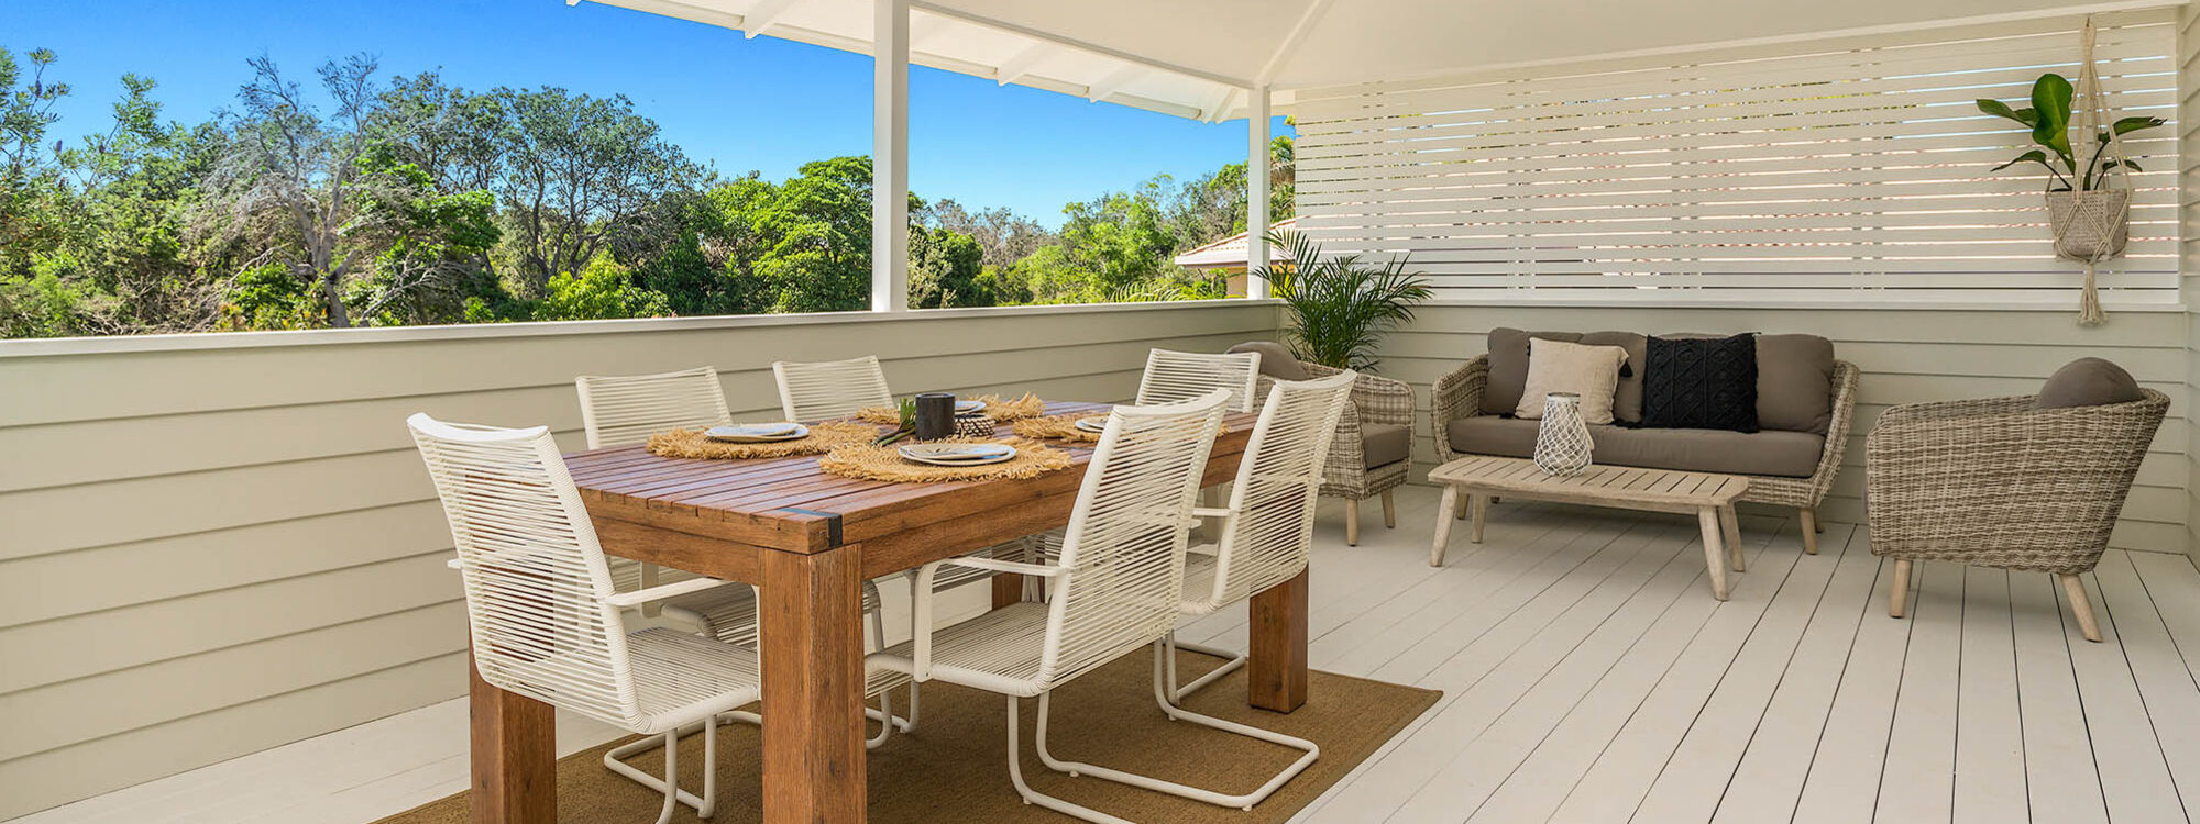 Castaway on Tallows - Byron Bay - Alfresco Dining Area on Balcony